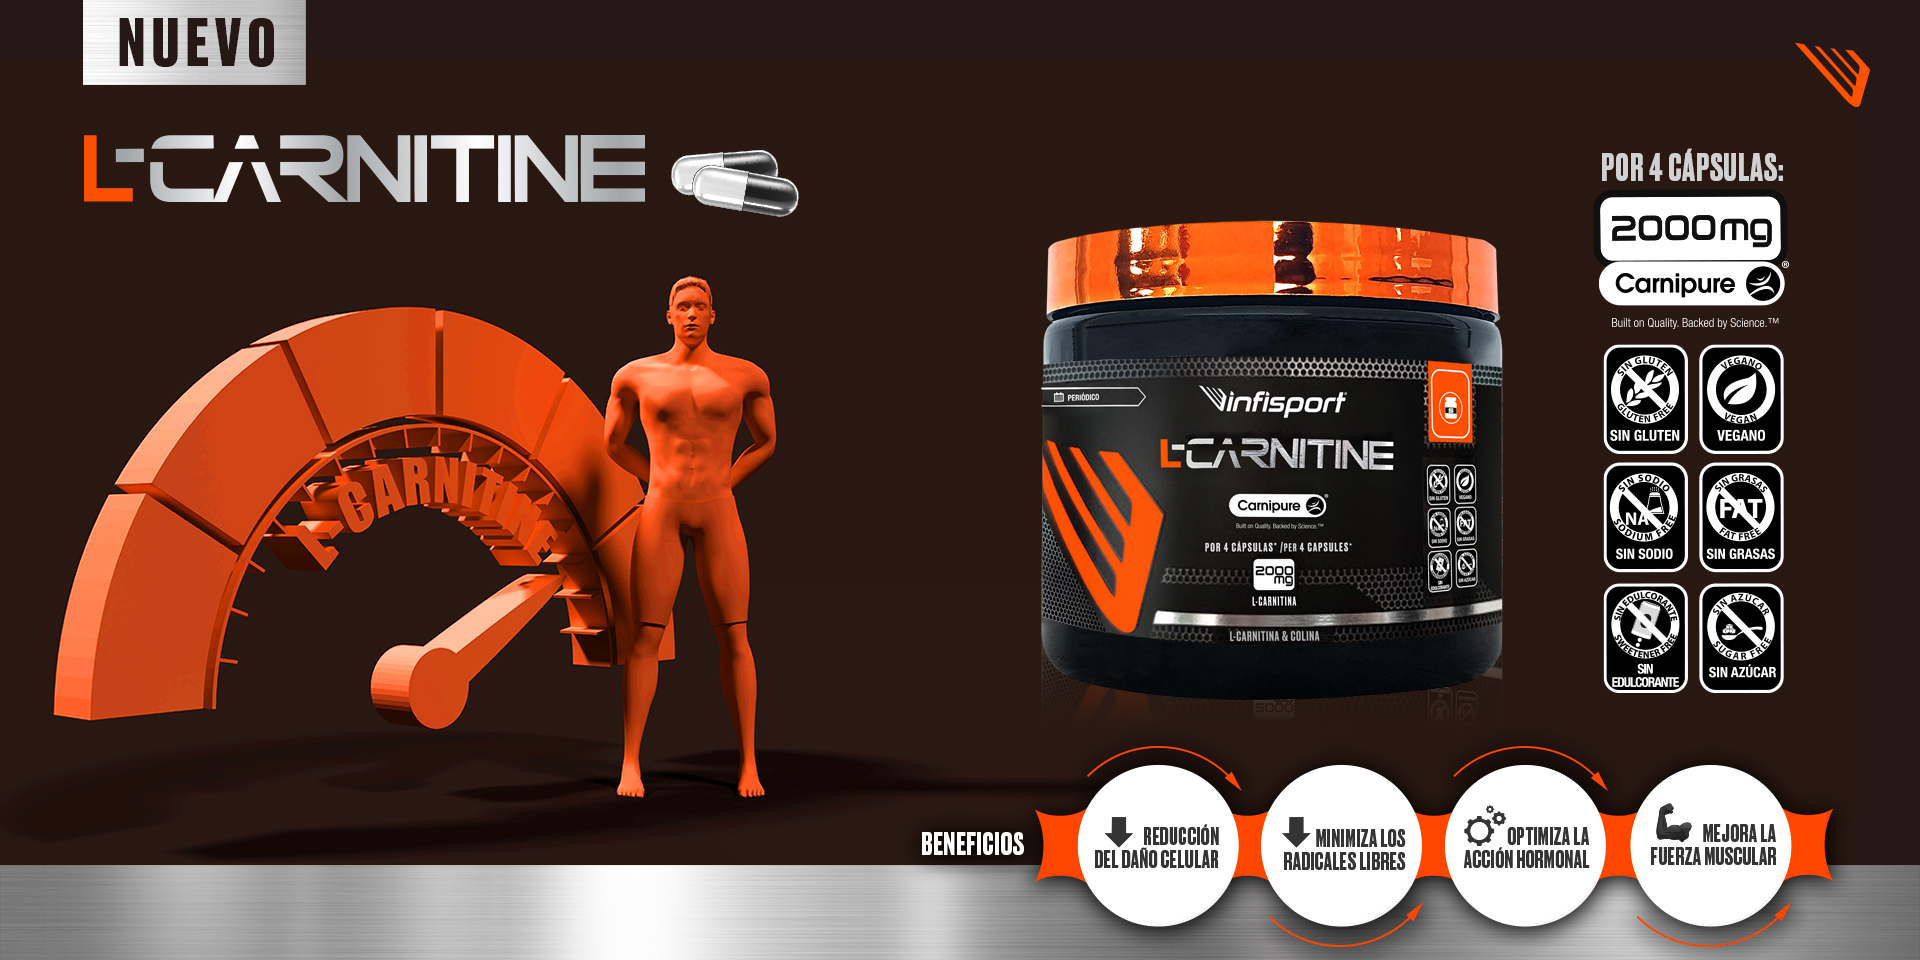 producto-suplementos-l-carnitine-capsulas